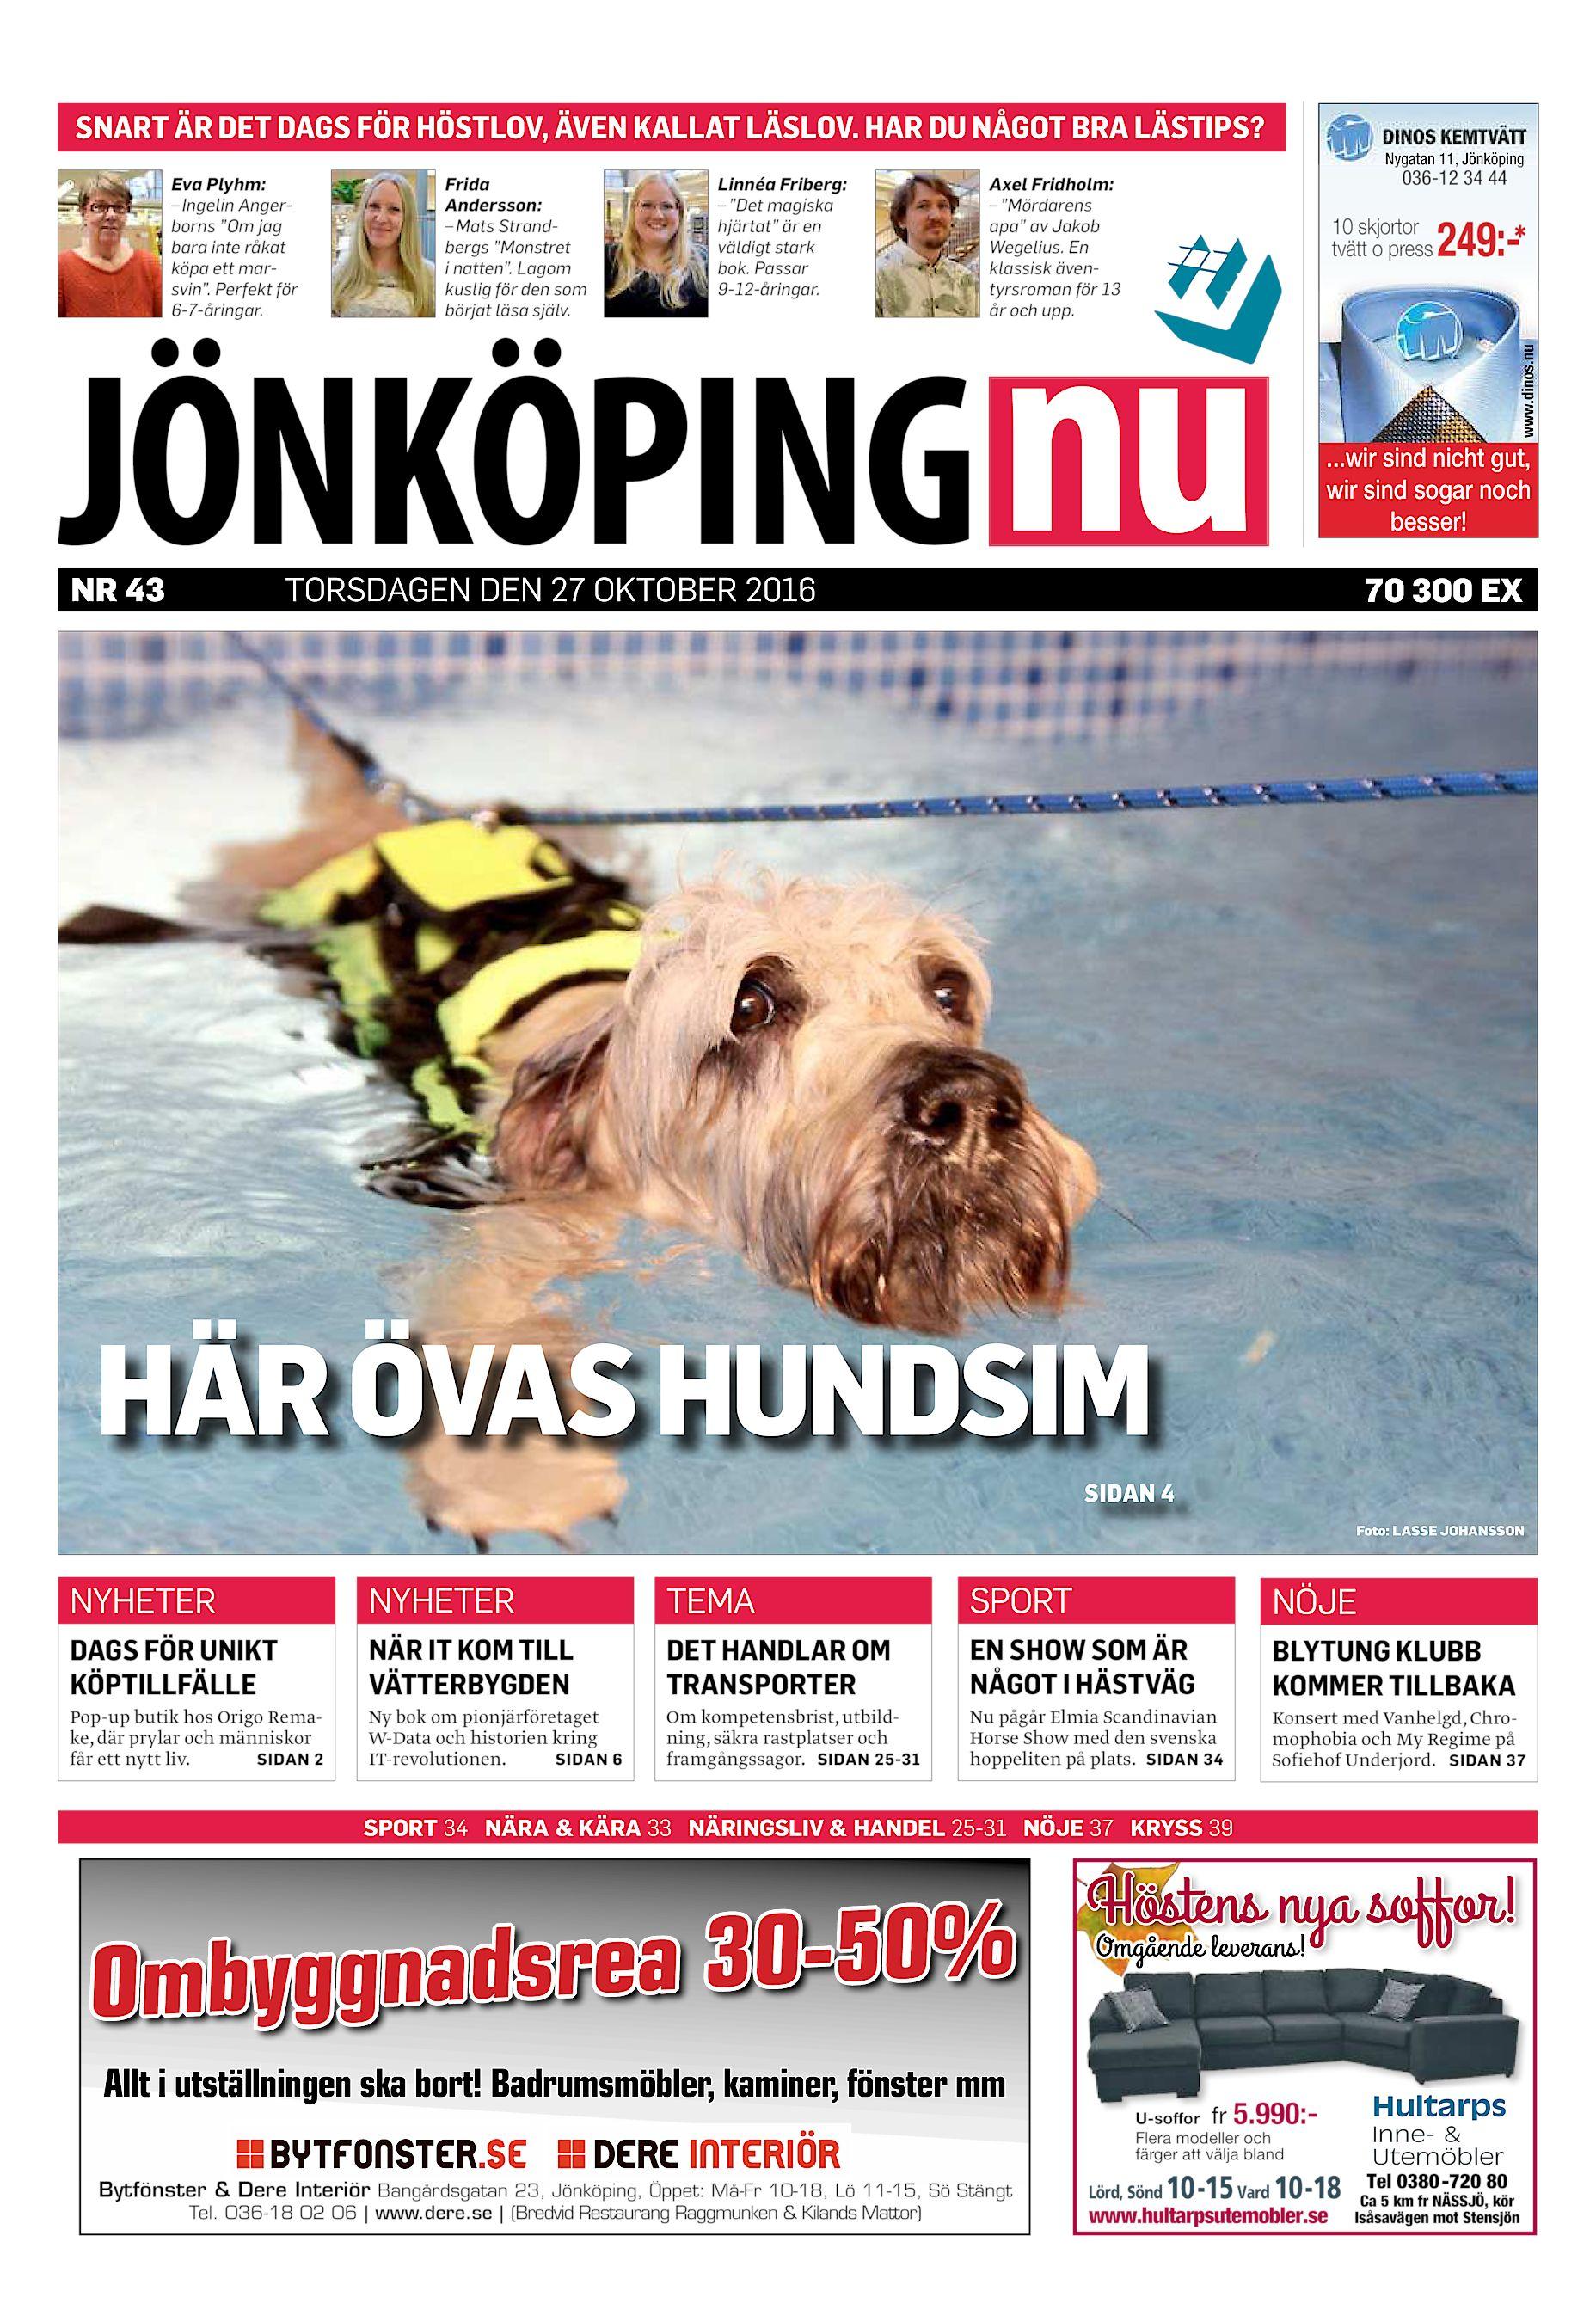 c2de174087d7bd Jönköping.nu JNU-20161027 (endast text)